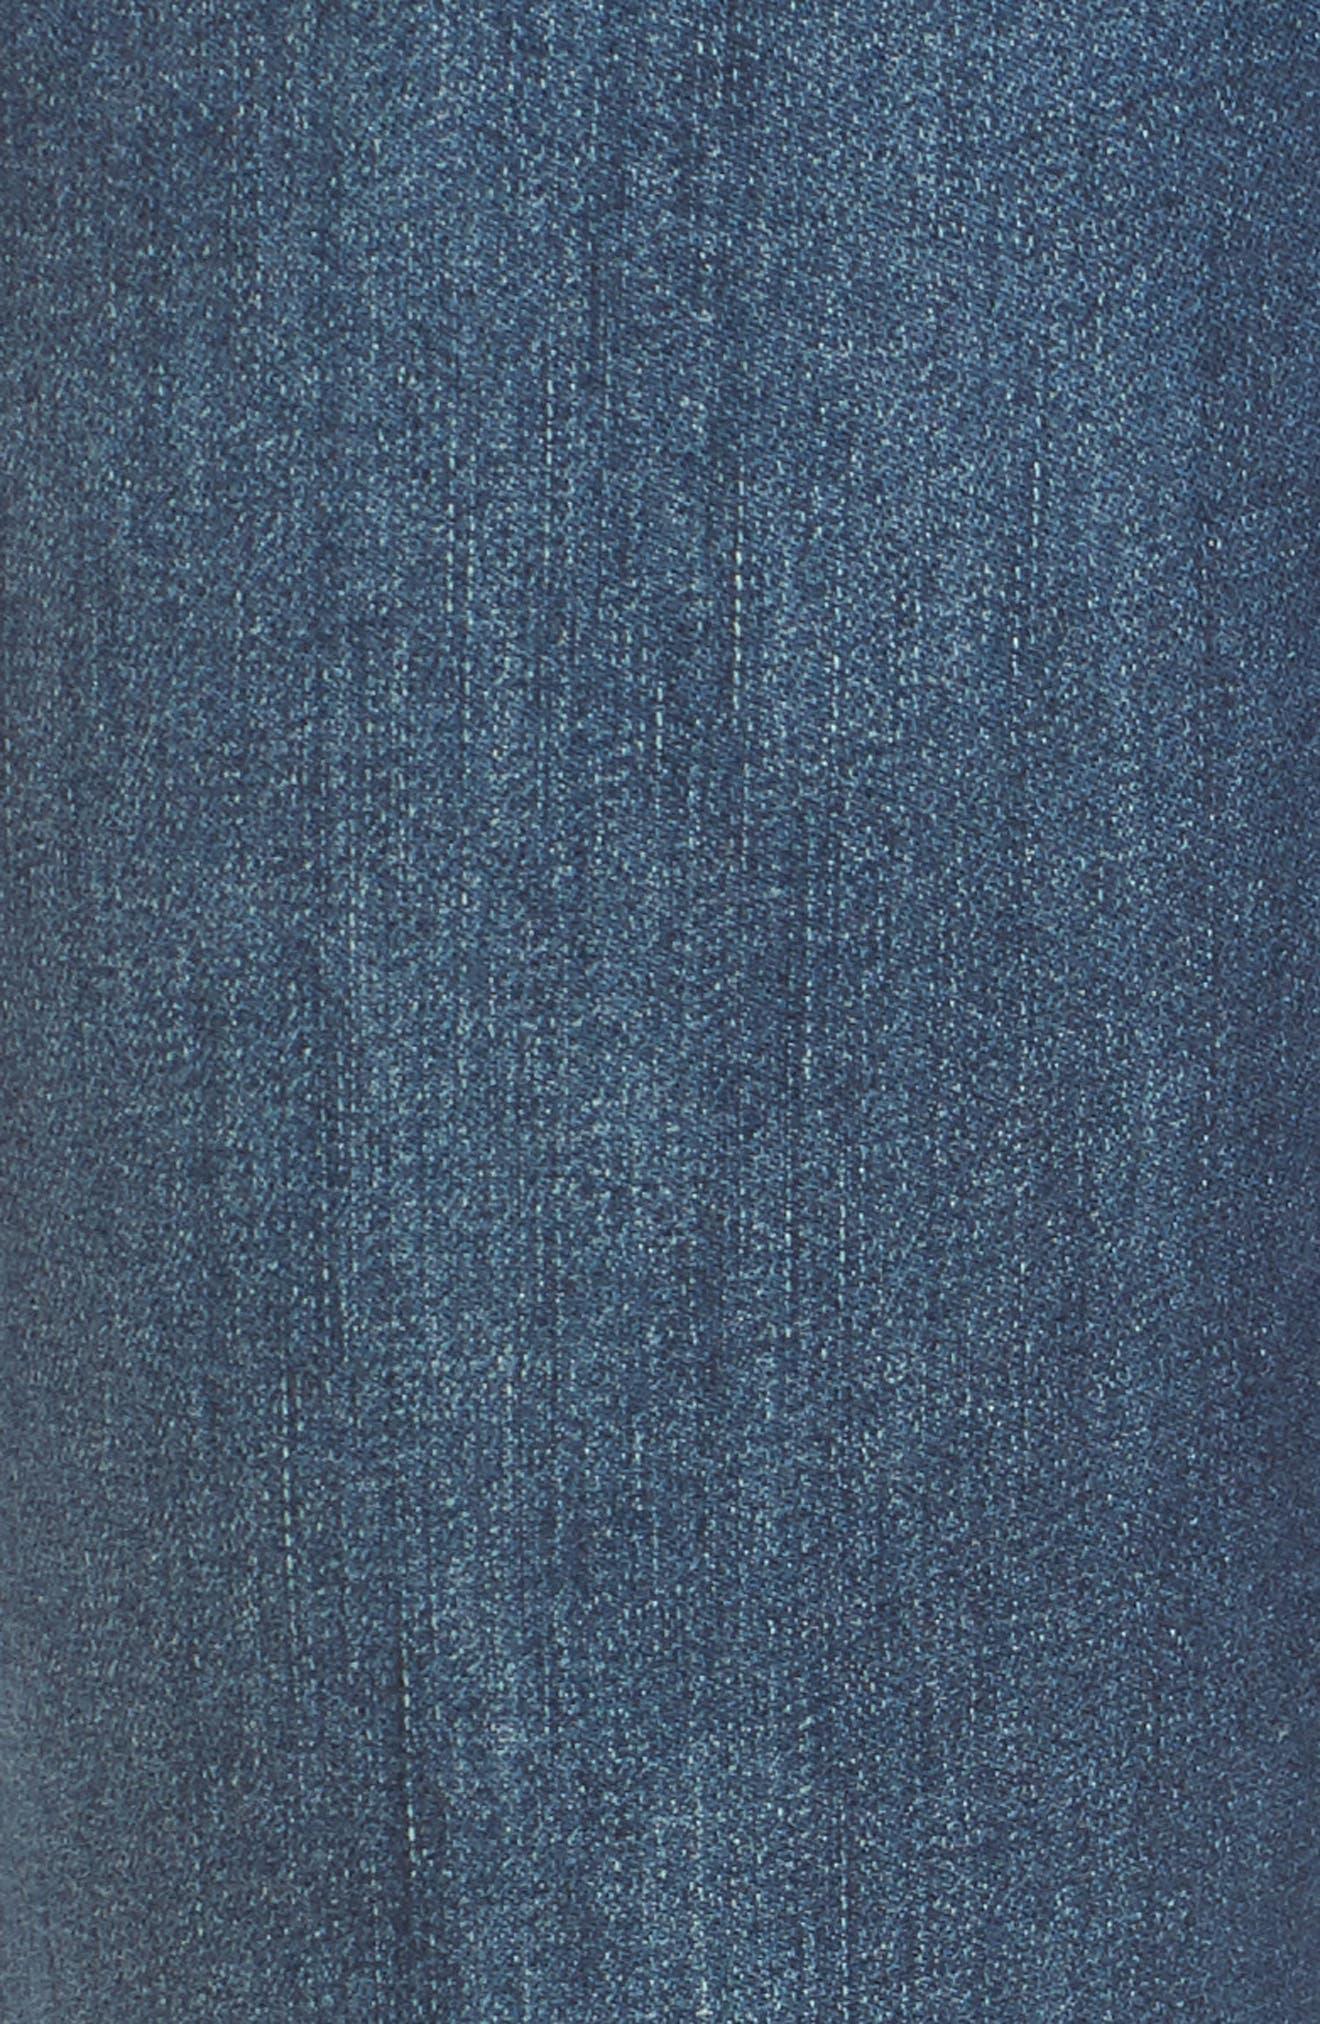 Tabitha Release Hem Crop Jeans,                             Alternate thumbnail 7, color,                             Montauk Mid Blue